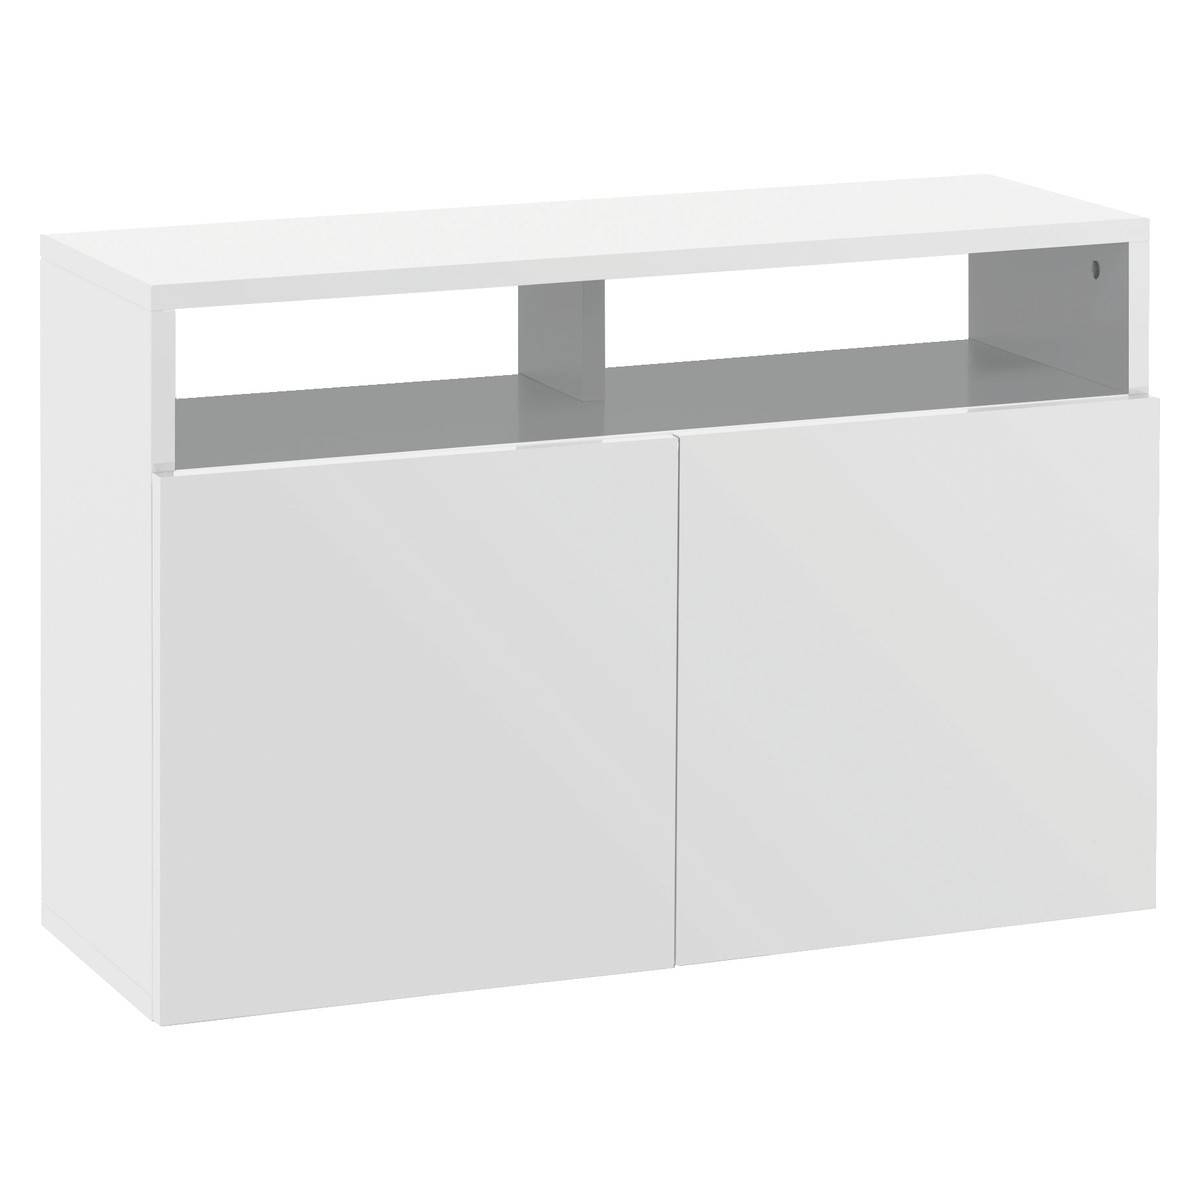 Sideboards, Cupboards & Cabinets In Oak & White – Habitat Uk Inside White High Gloss Sideboard (View 13 of 20)